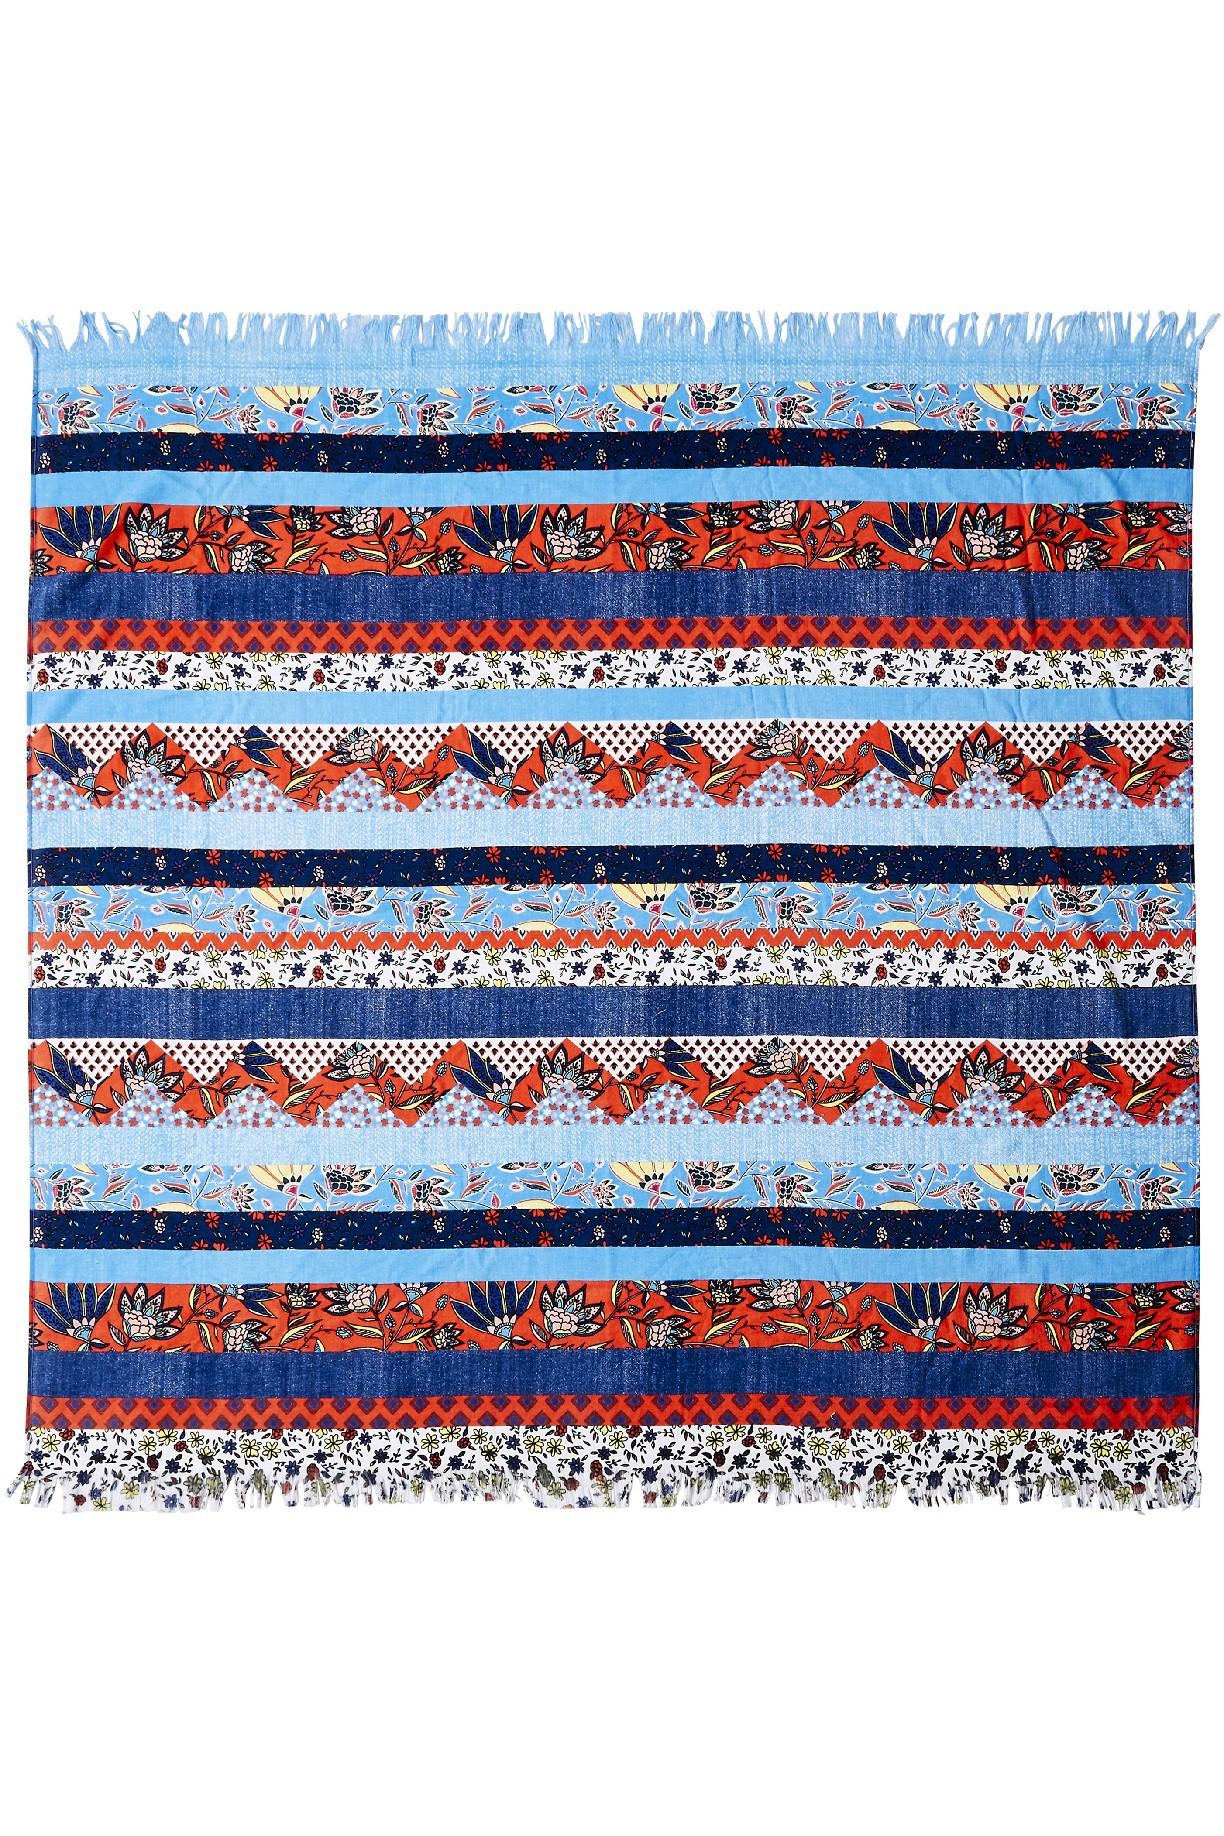 Törülköző Seafolly Folk Blanket & Bag Sienna